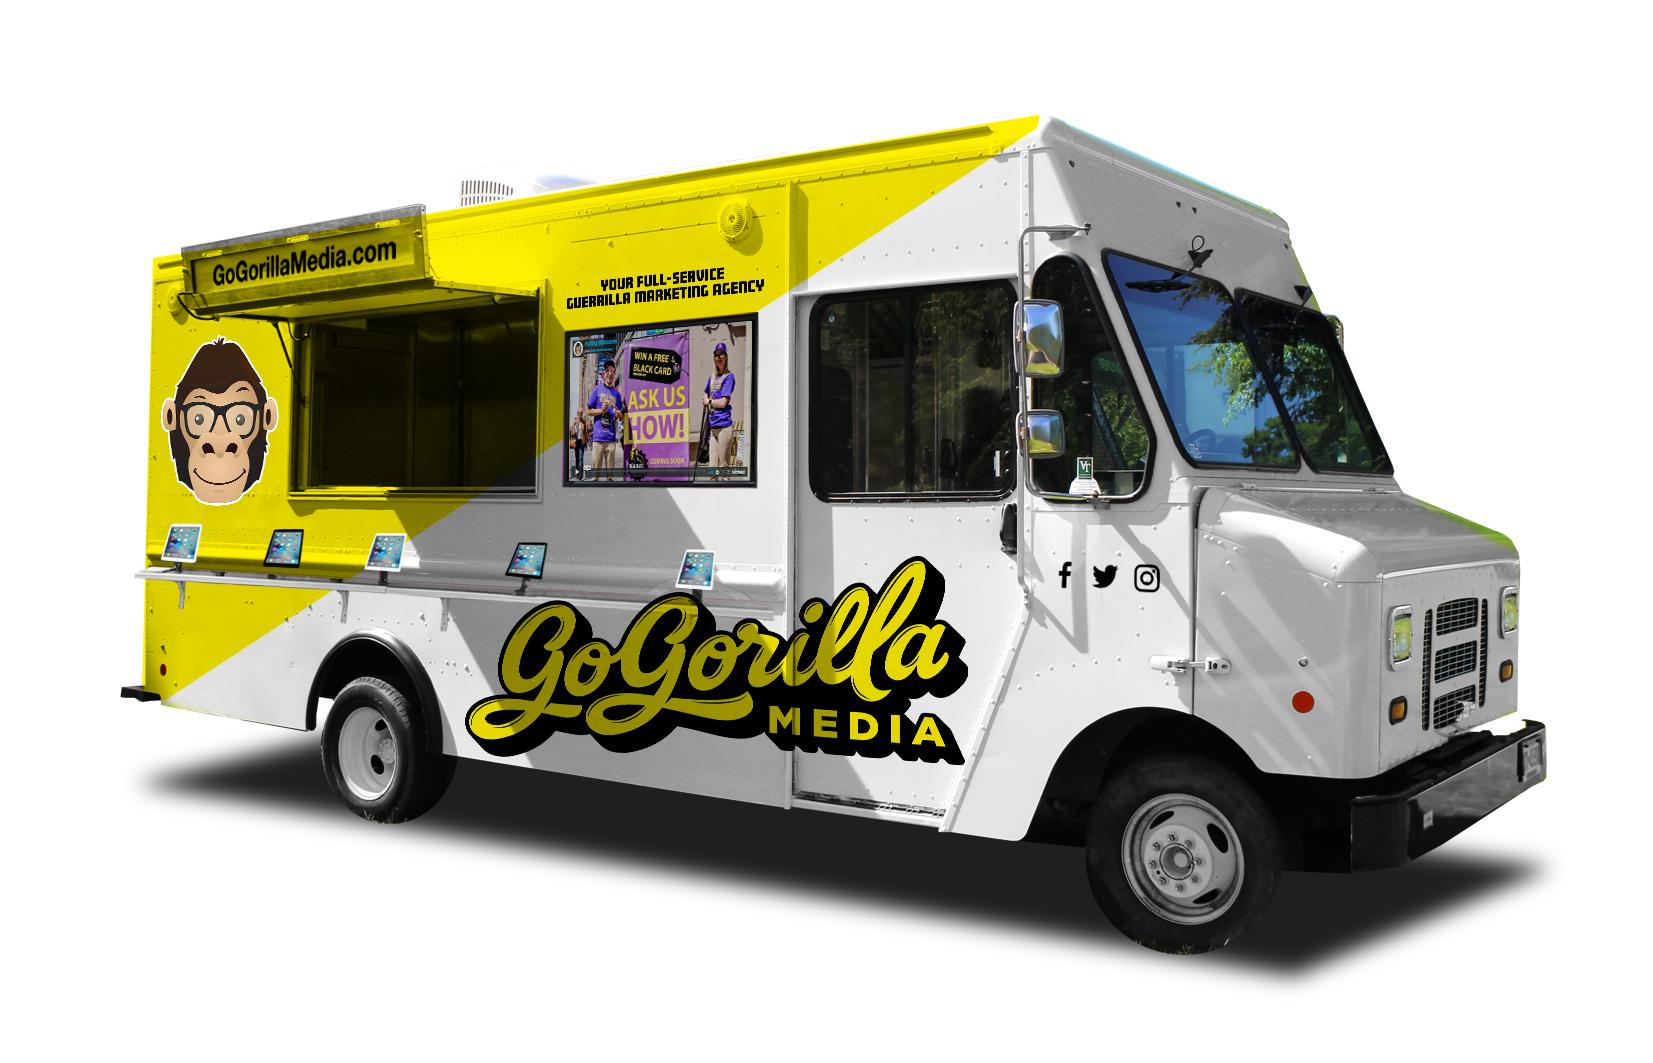 go gorilla3_truck (1).png